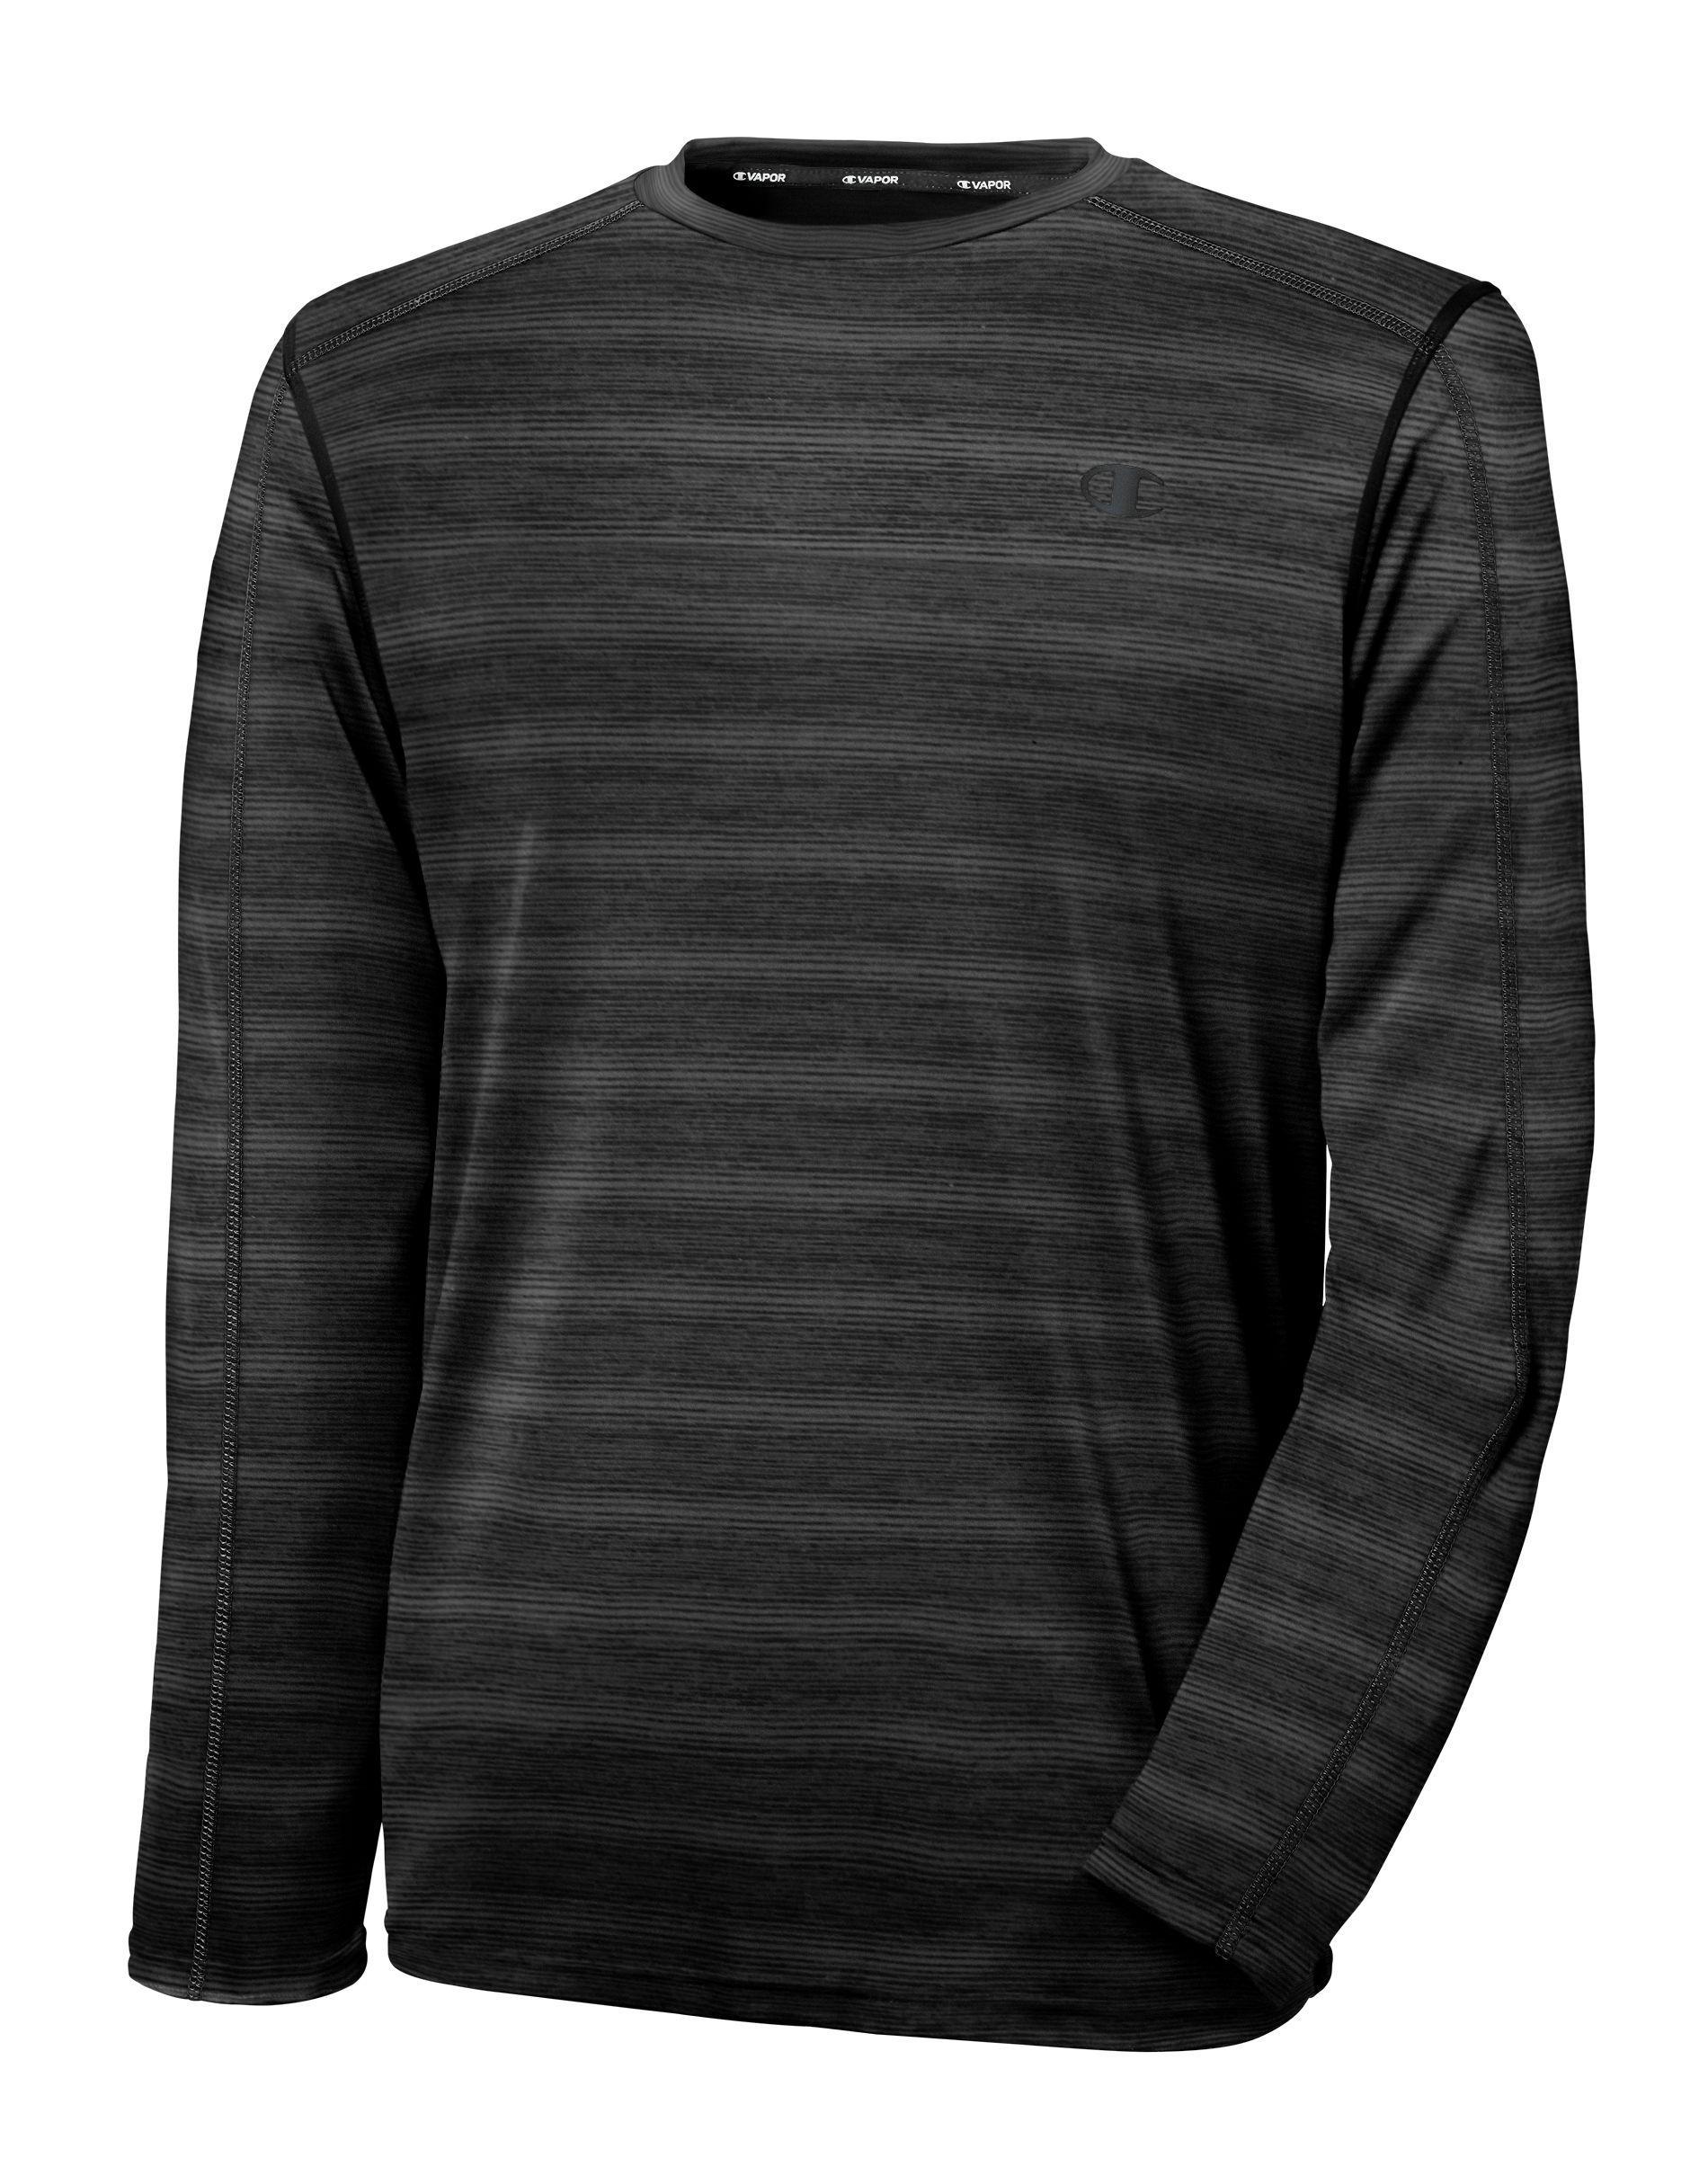 6851f034 Champion Mens Vapor Powertrain Heathered Long Sleeve T Shirt